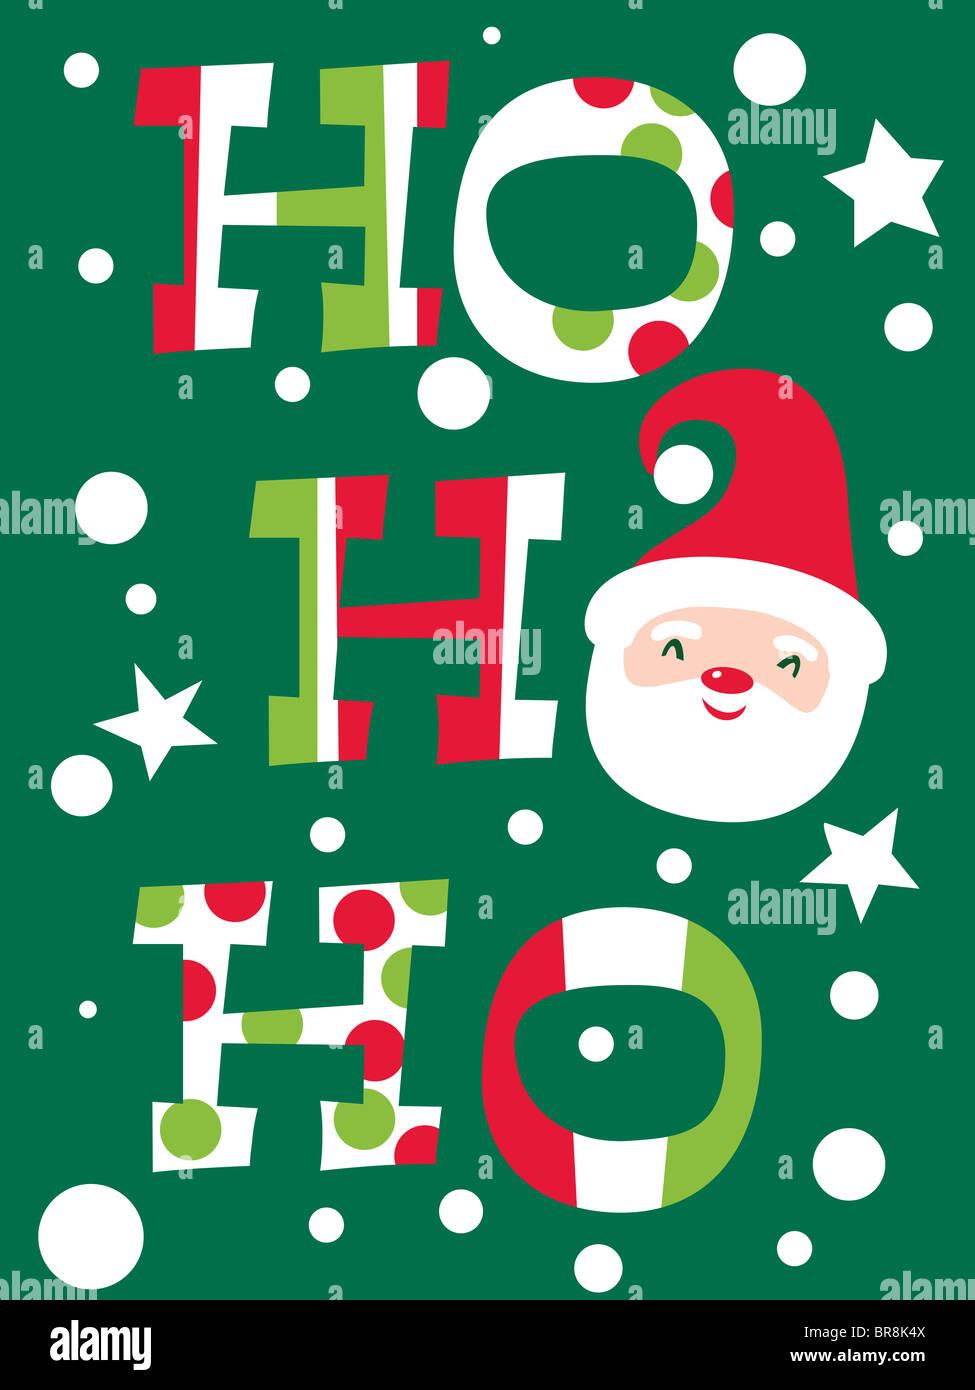 Babbo Natale Ho Ho Ho.Un Natale In Base Illustrazione Con Le Parole Ho Ho Ho E Un Immagine